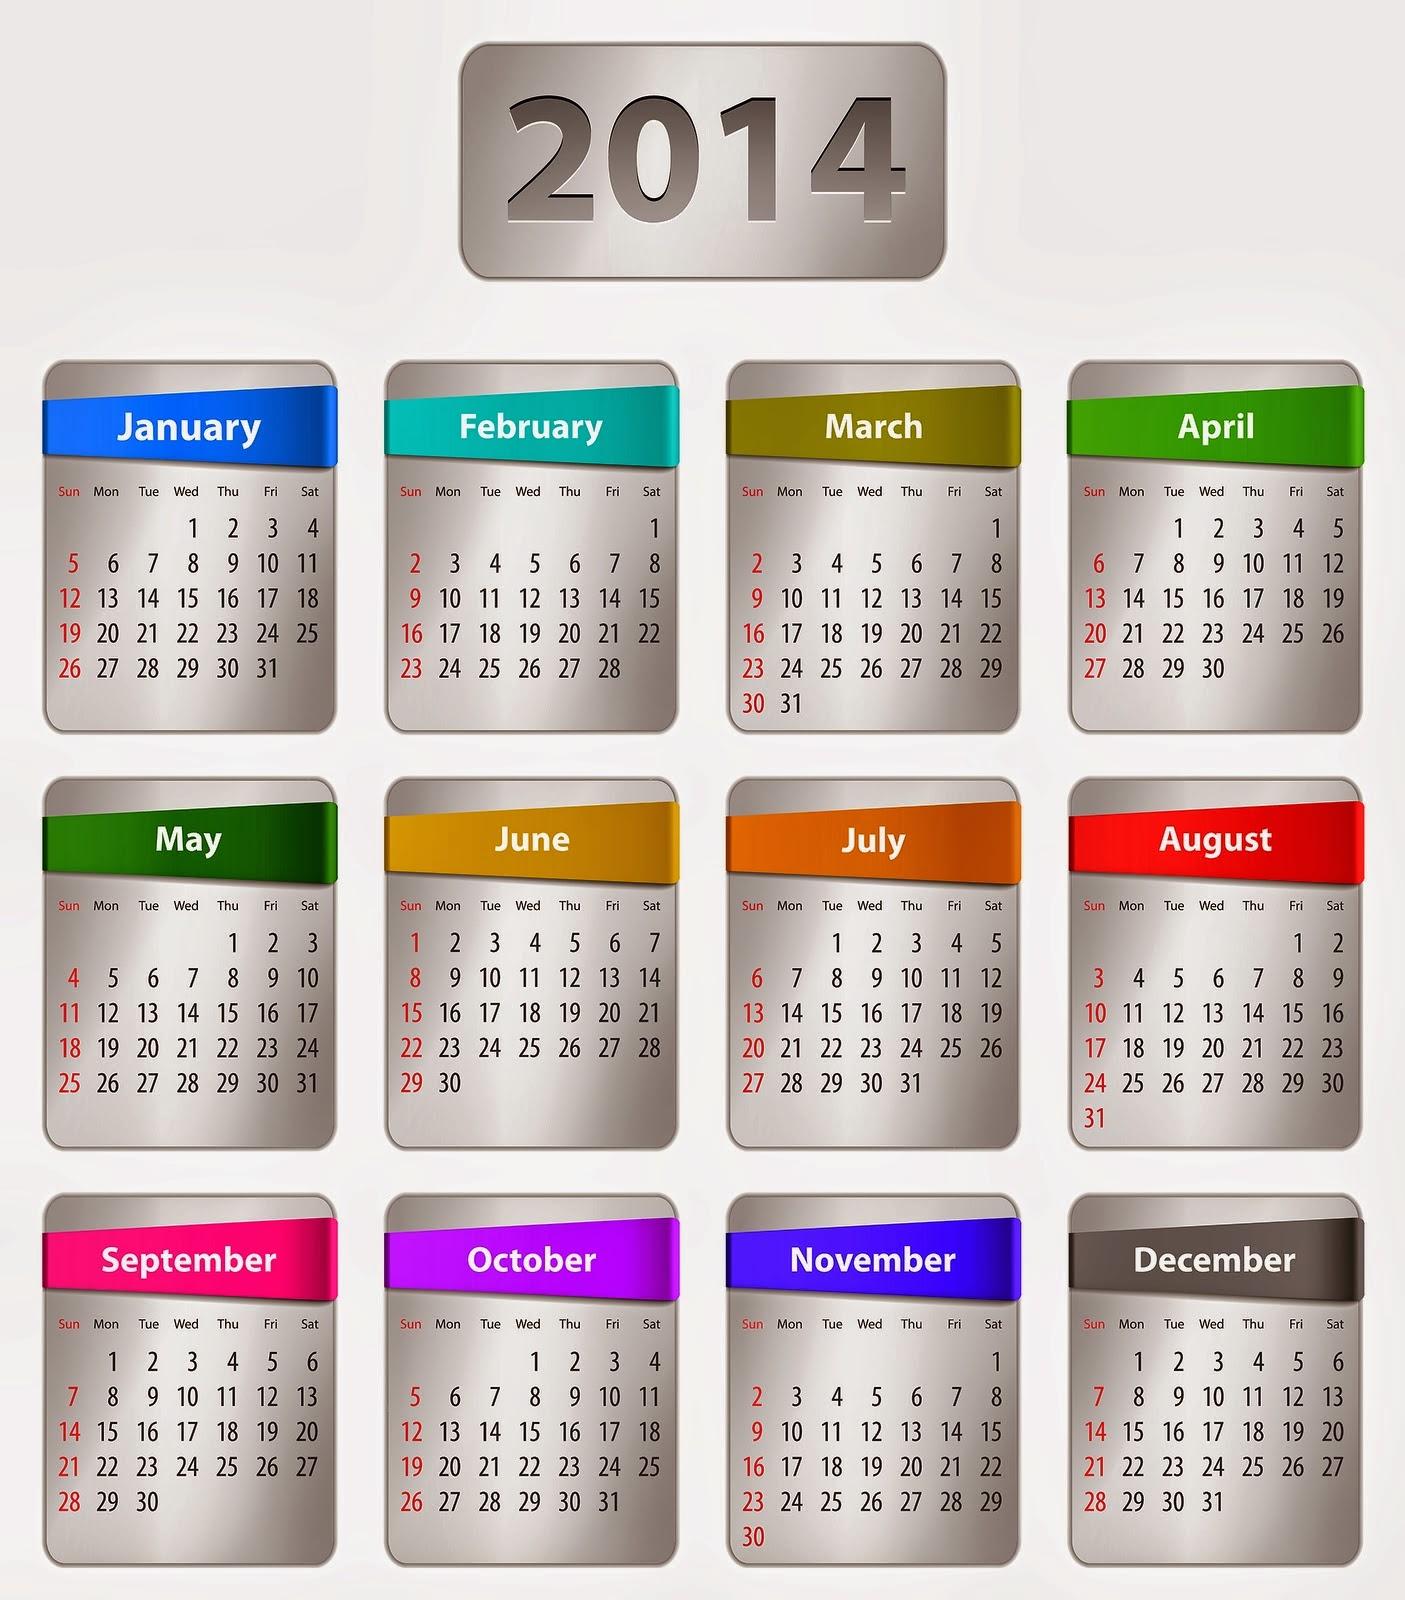 Desktop Wallpaper January 2014: Desktop Wallpaper Calendar Creator